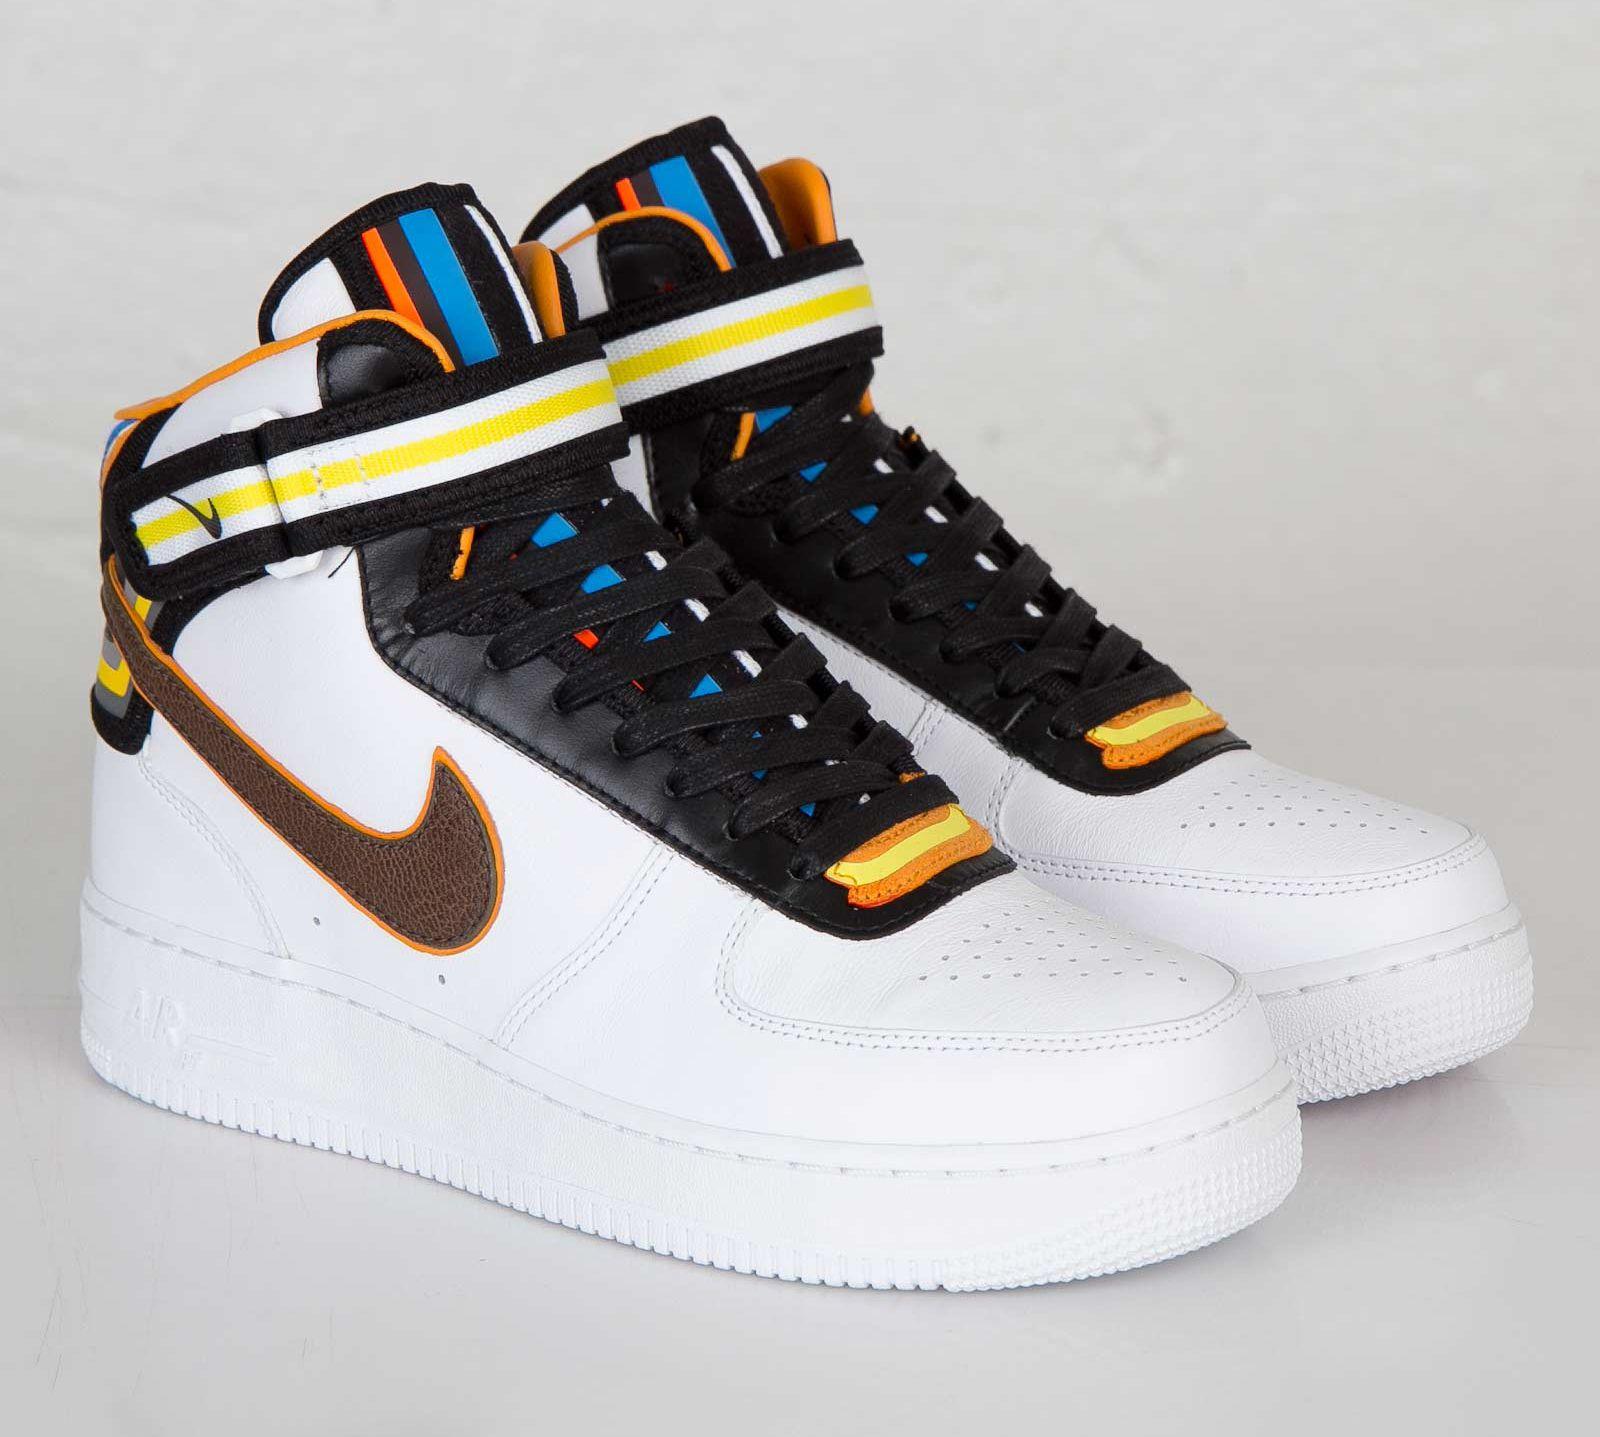 Riccardo Tisci X Nike Air Force 1 Salut Sp Rt John